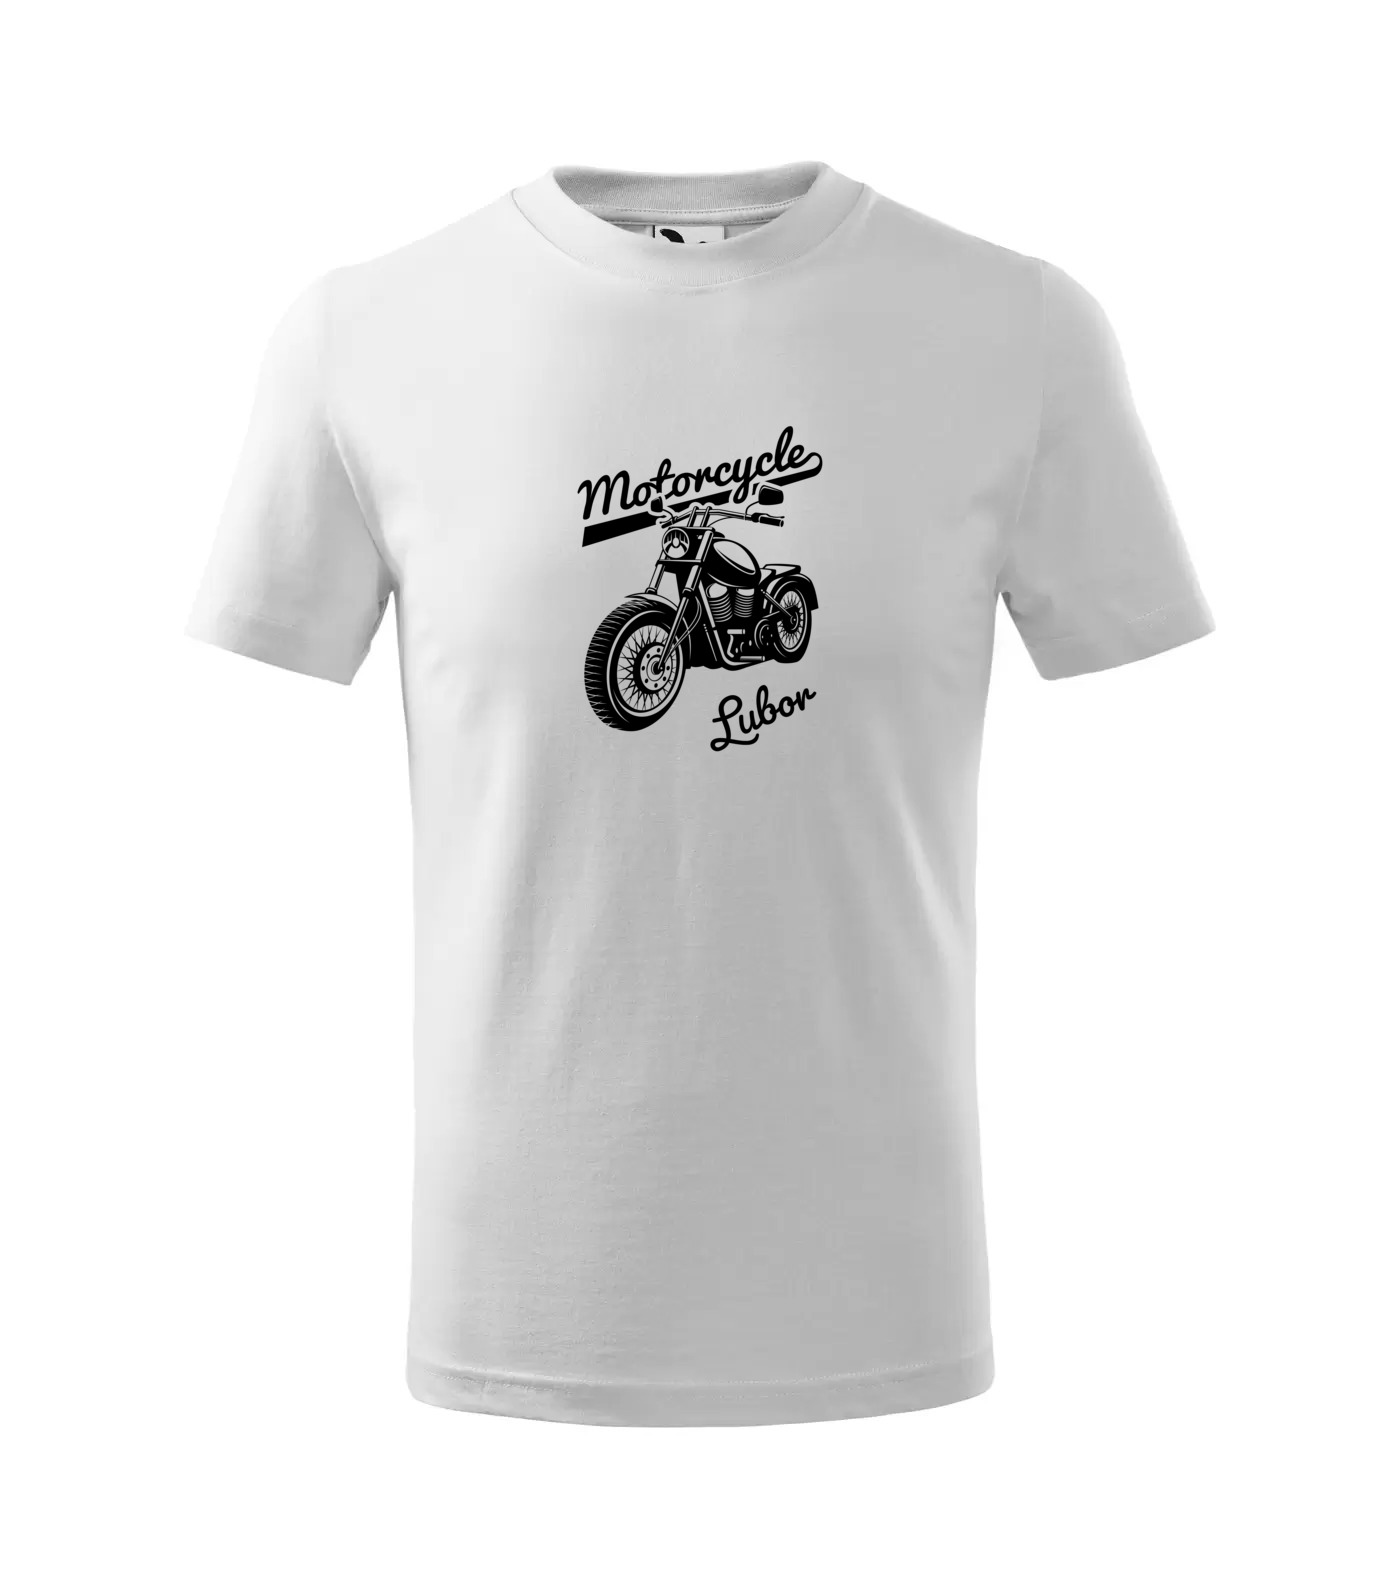 Tričko Motorkář Inverse Lubor